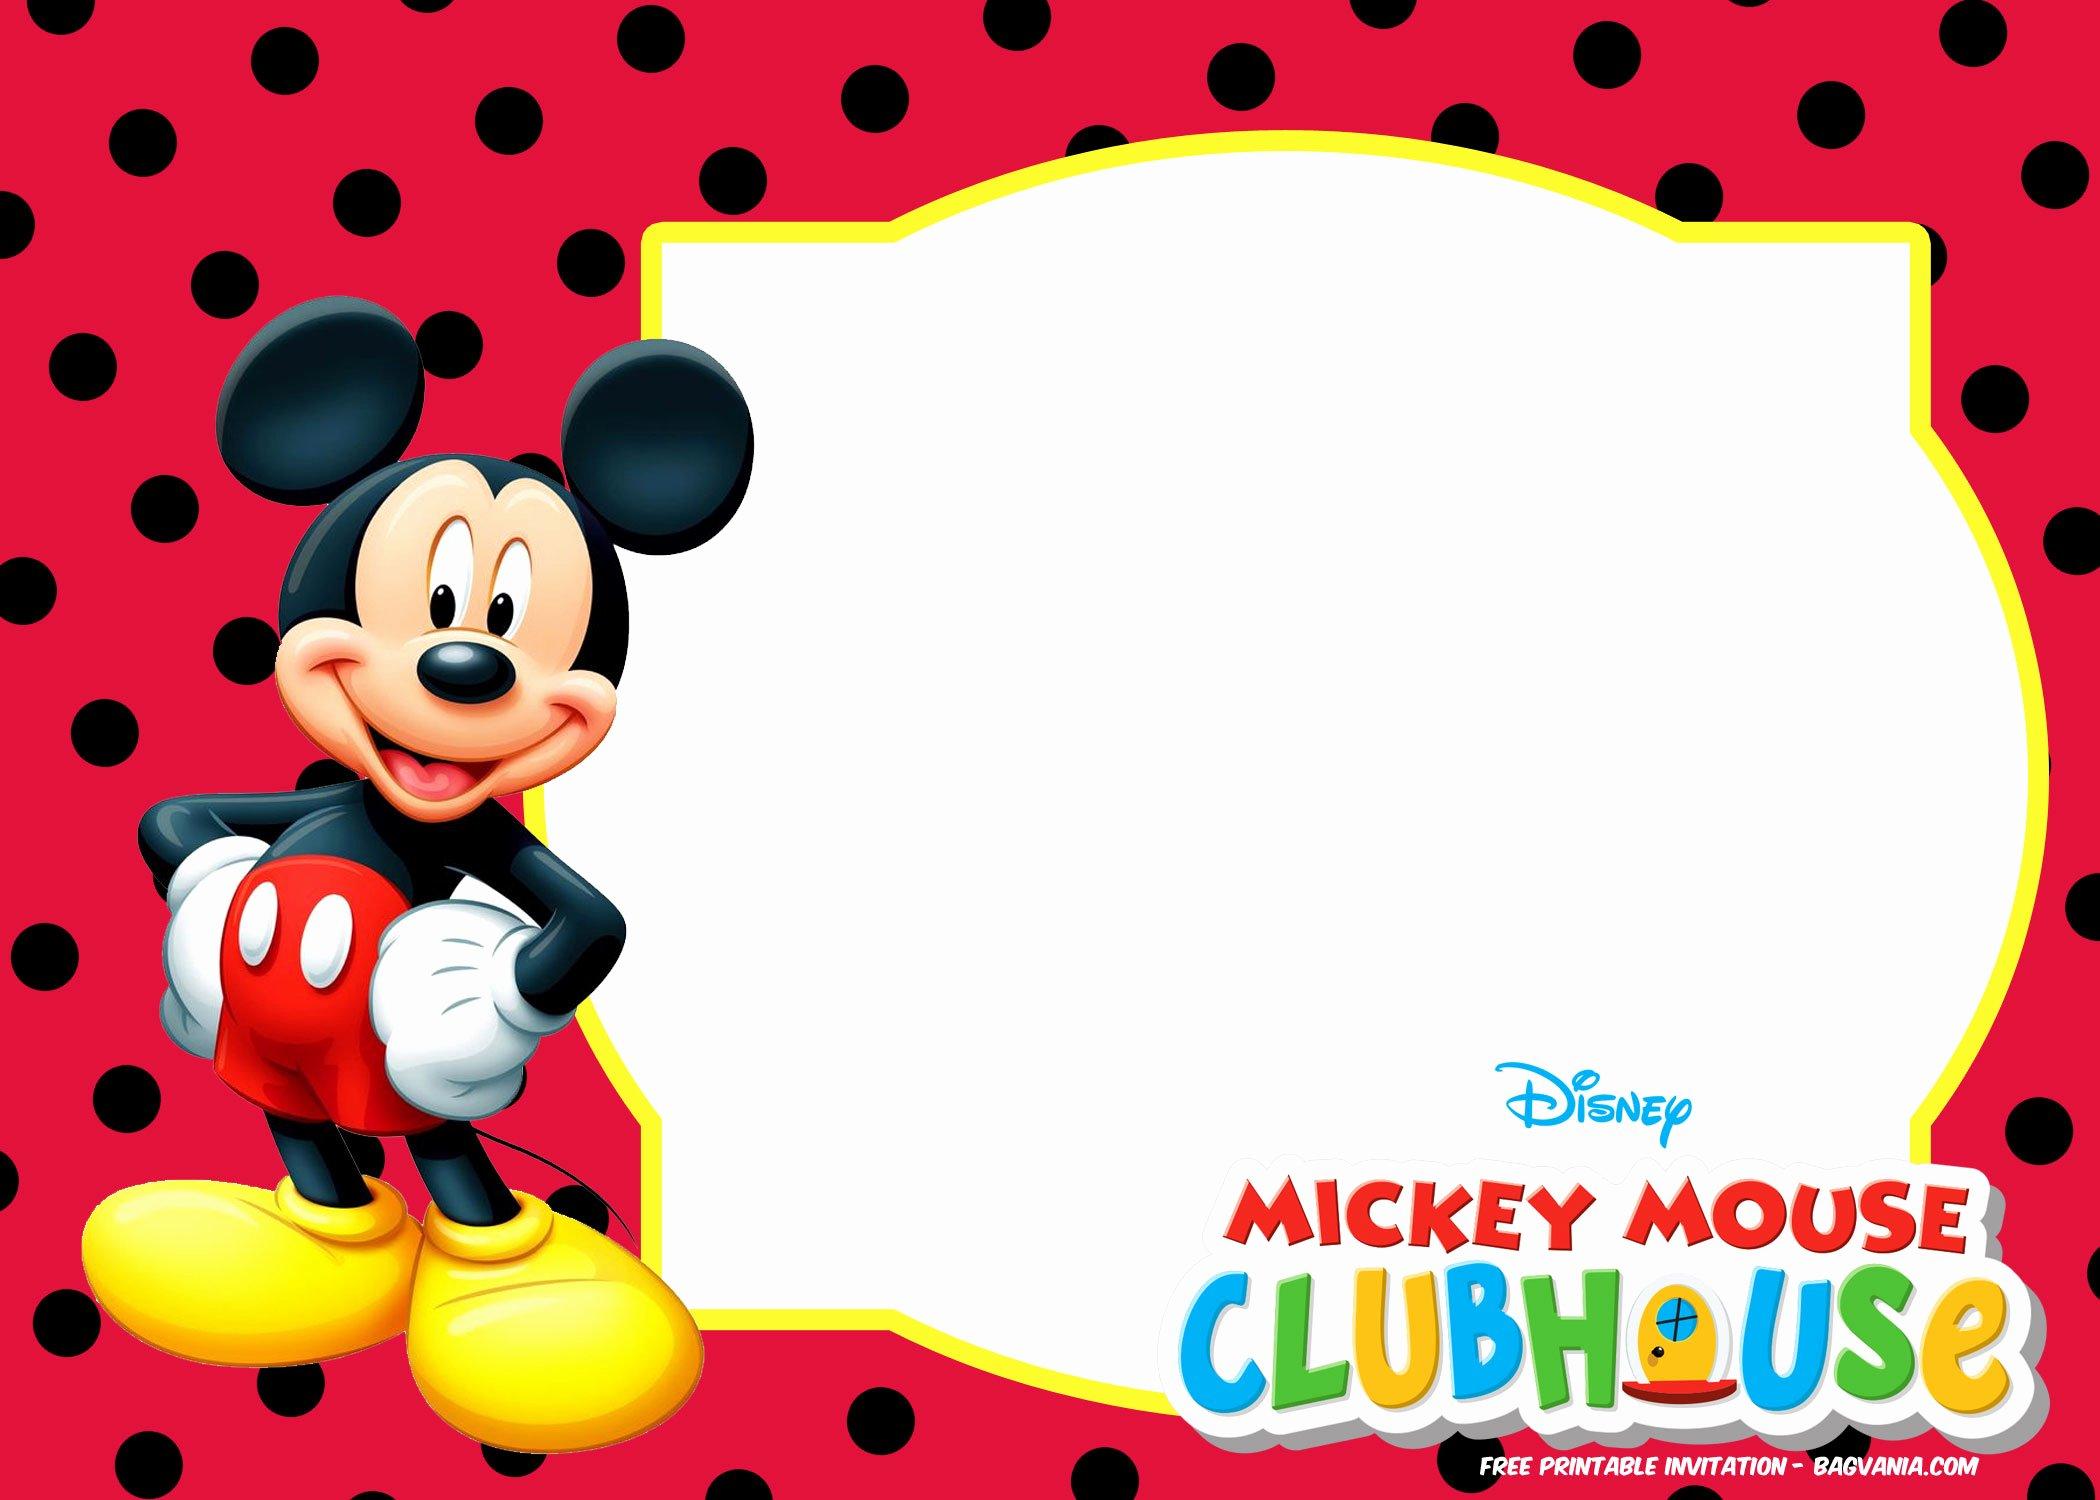 Mickey Mouse Invitations Templates Elegant Free Mickey Mouse Invitation Templates – Polka Dots – Free Printable Birthday Invitation